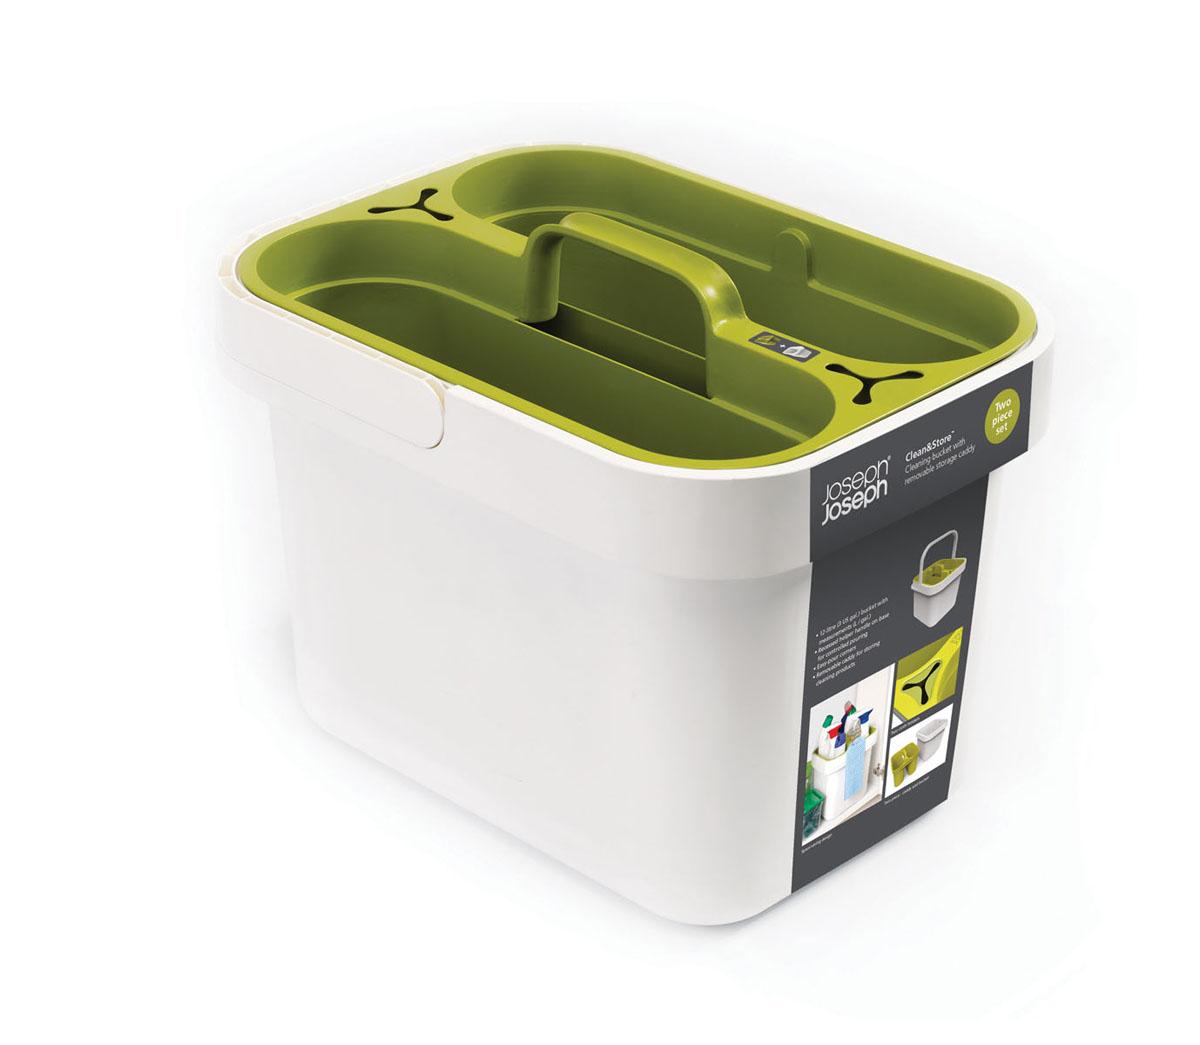 "Joseph Joseph Контейнер хозяйственный ""Clean&Store"", цвет: белый, зеленый. 85029"